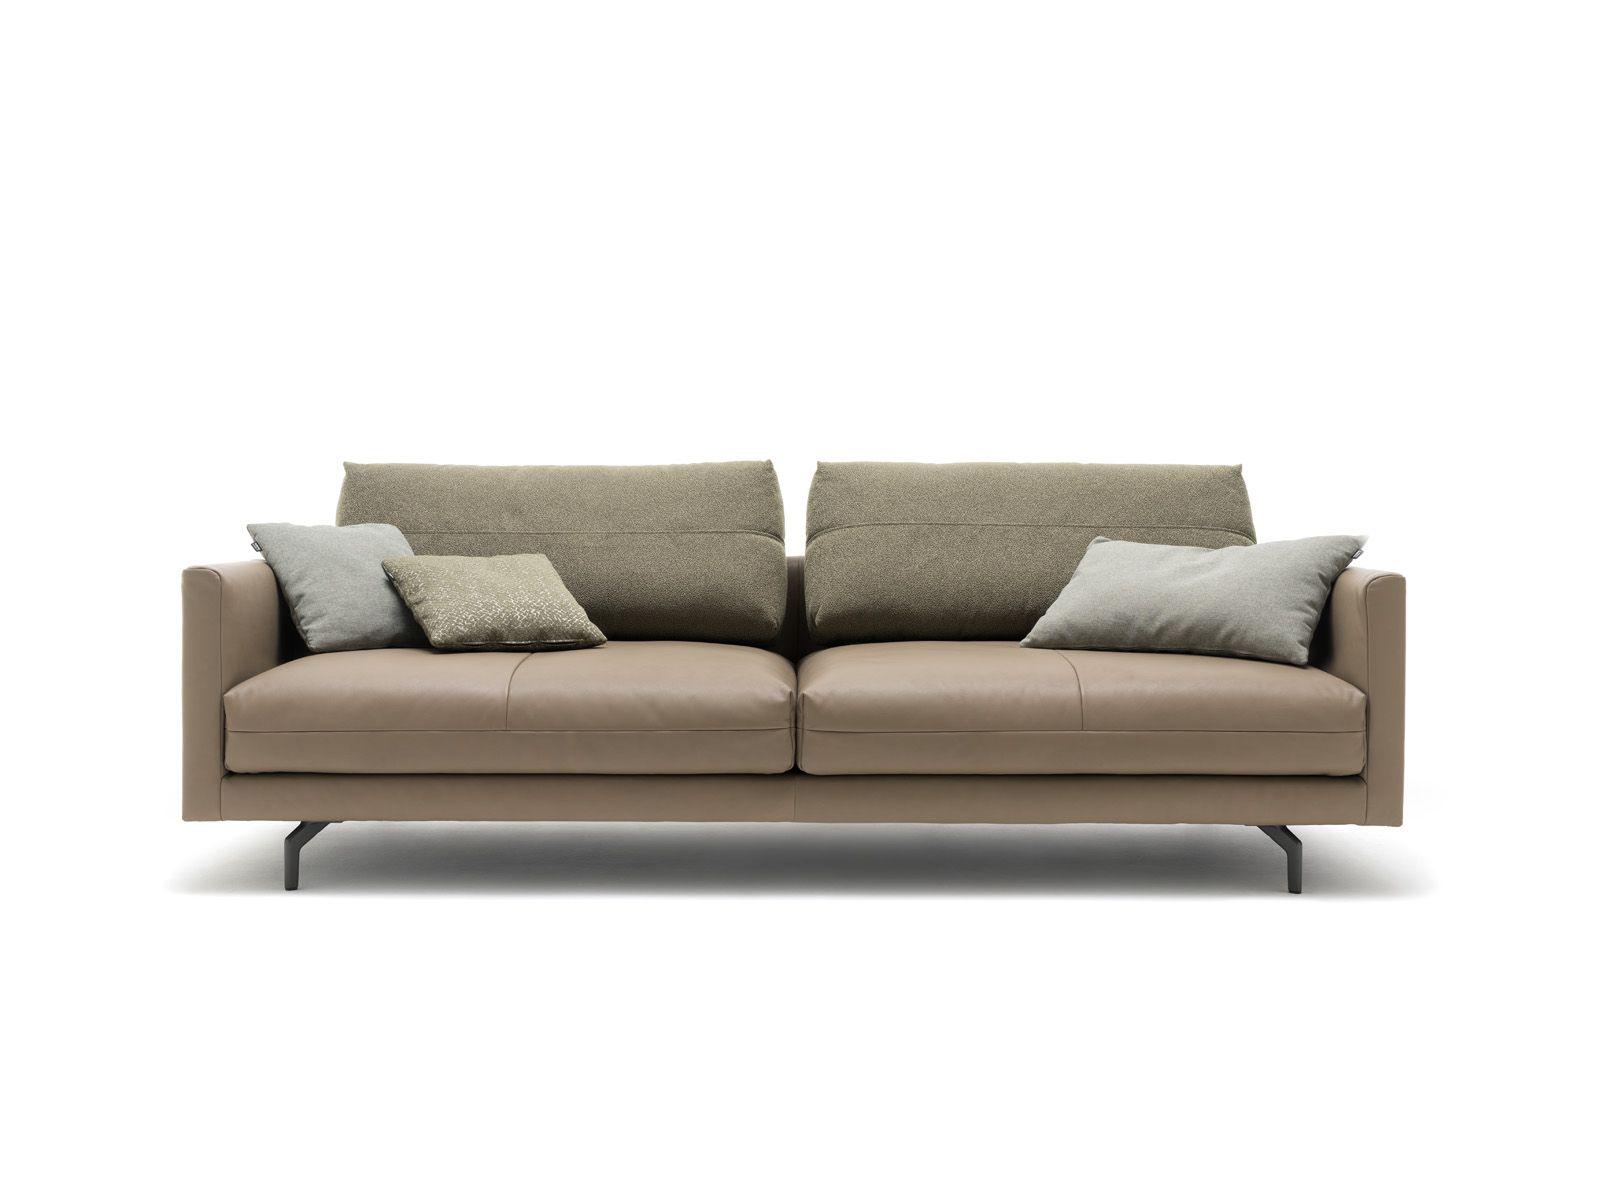 Extrem Big Sofa Gus Mix Modular Sofa 3 Pieces The Century House